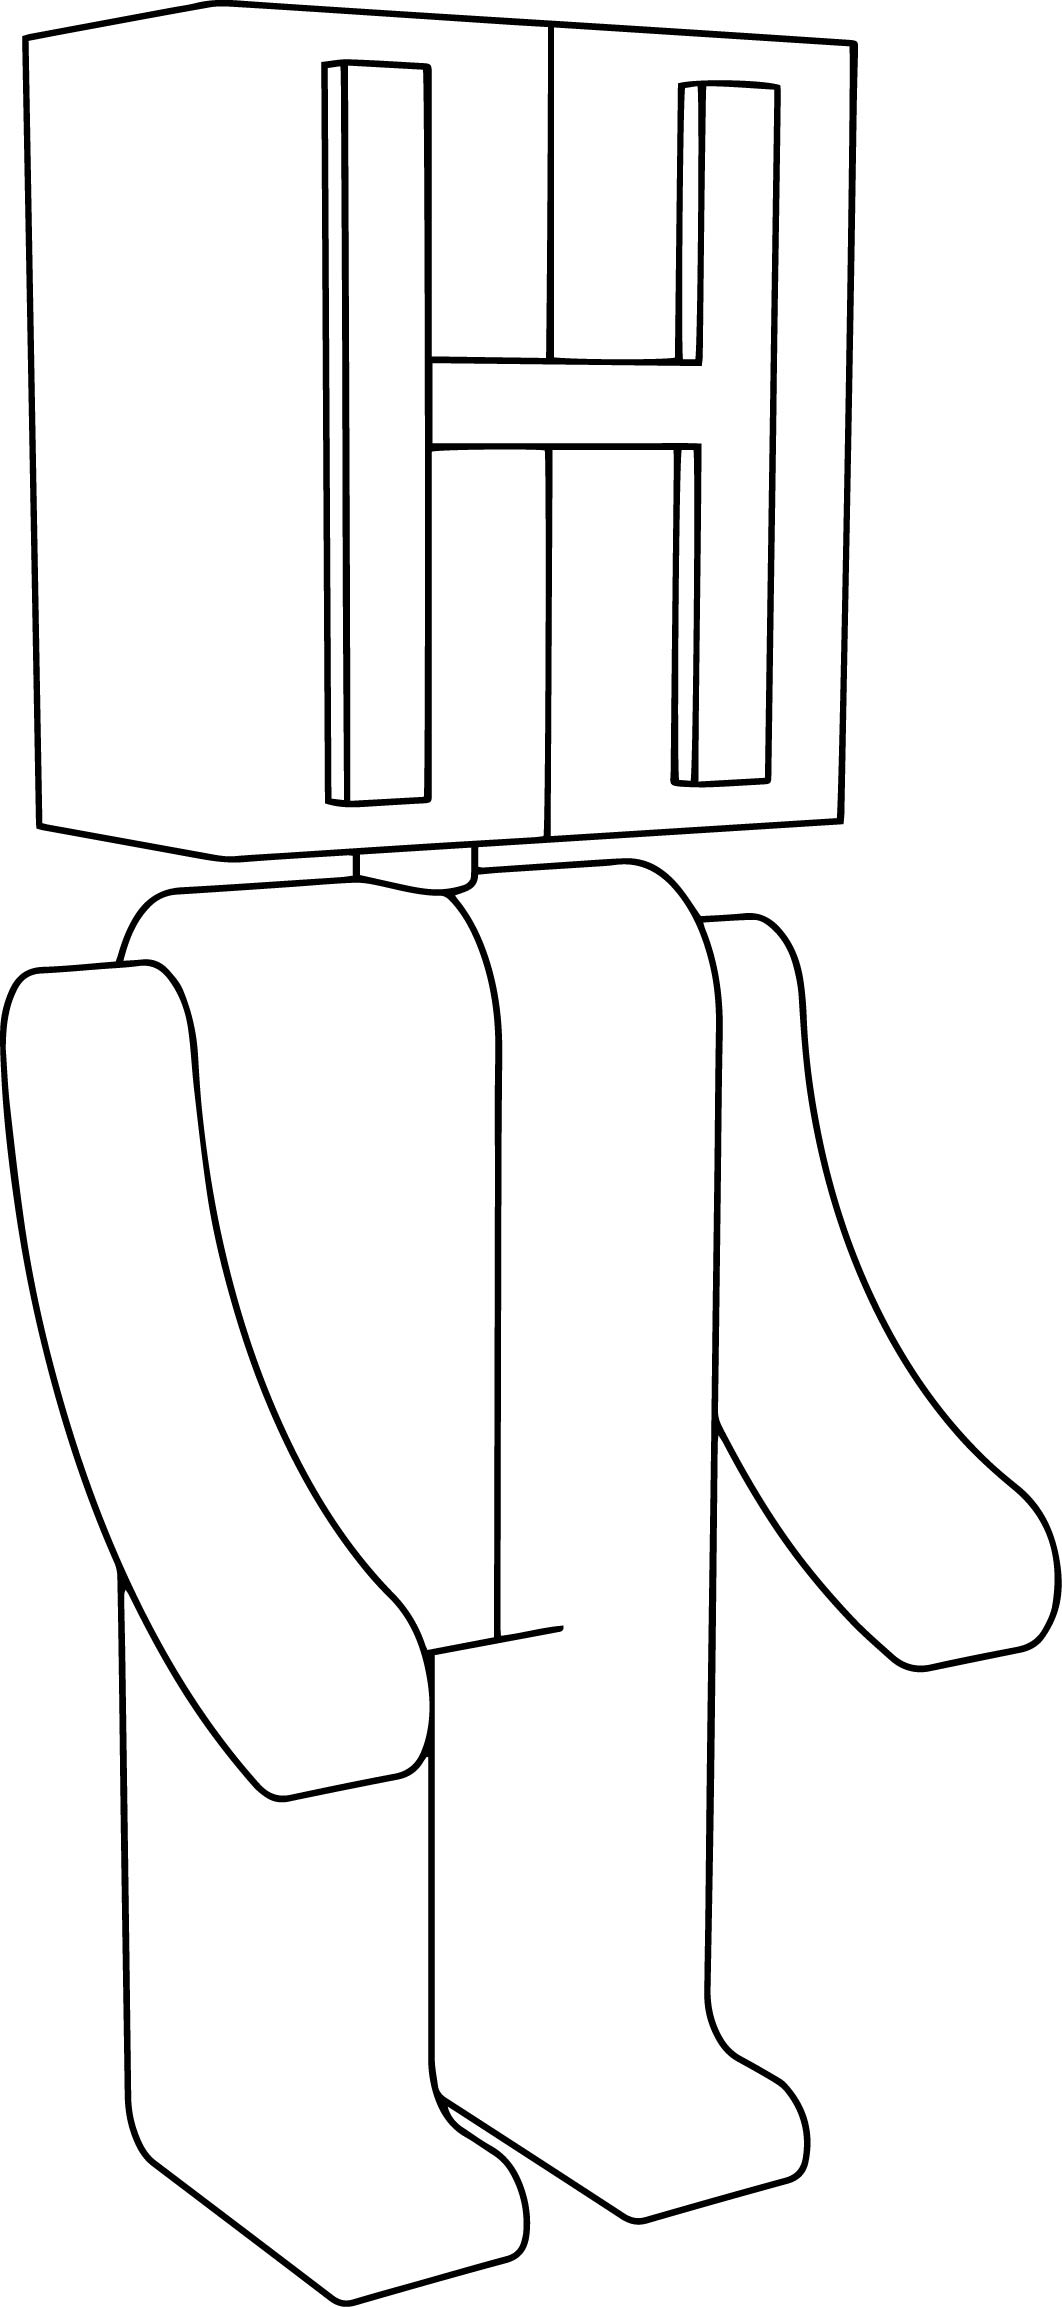 H Robot Cartoon Coloring Page